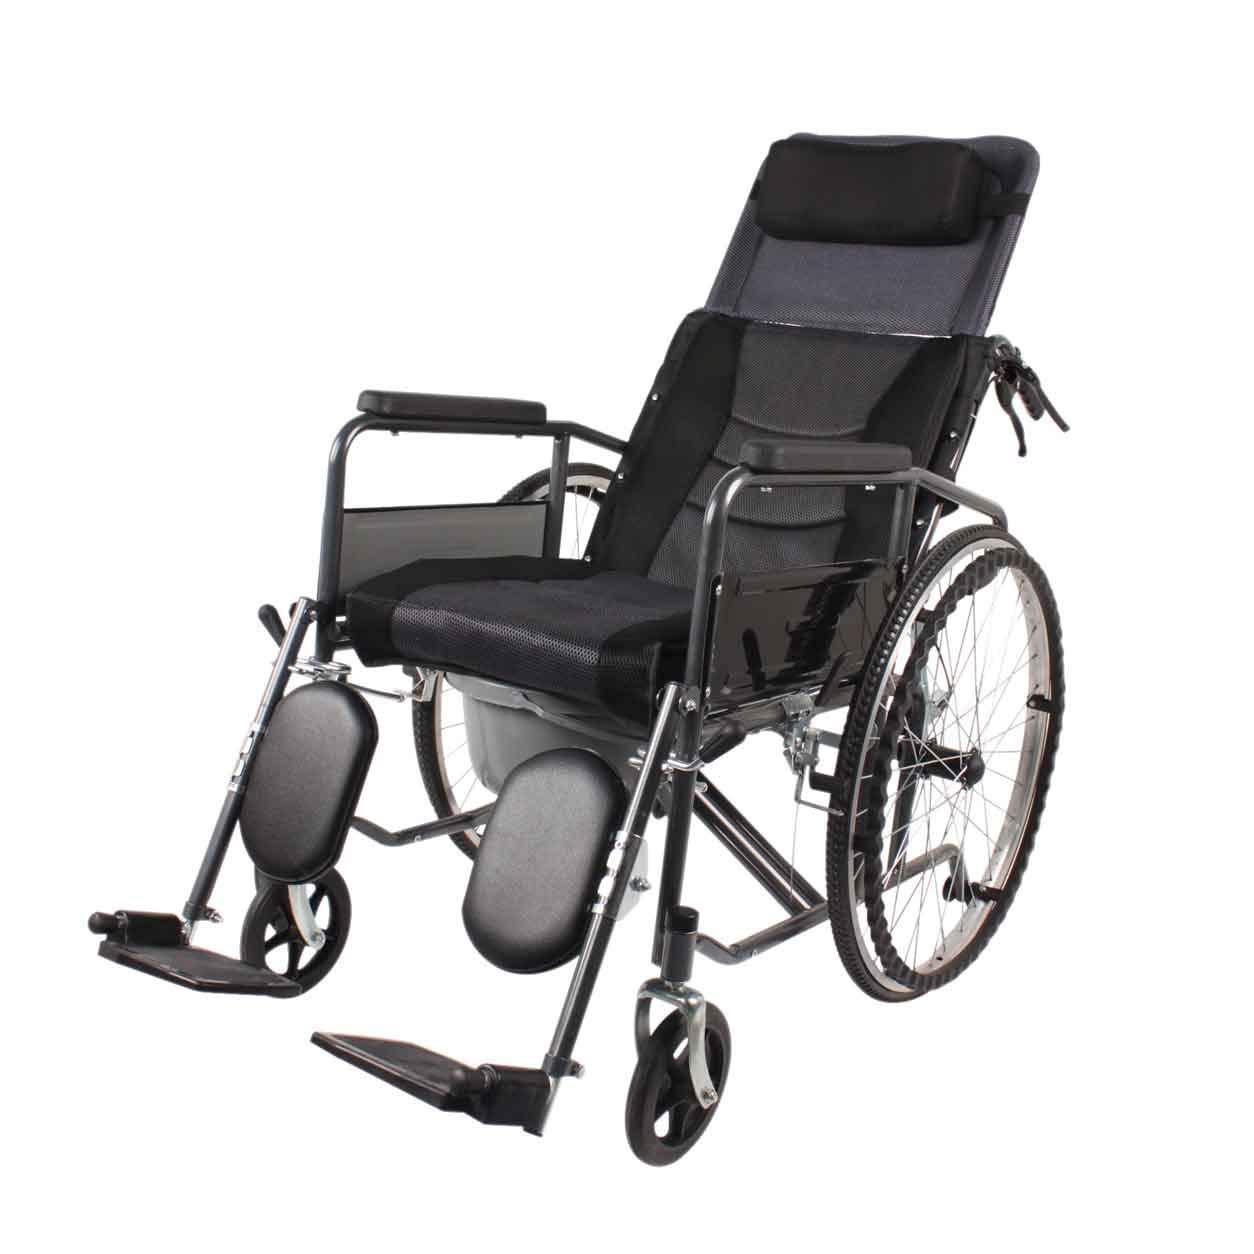 YANGLIYU Wheels Folding Self Propelled Wheelchair,Attendant-Propelled Wheelchair,Lightweight Folding Transit Travel Wheelchair ,Fully Lying Multi-Function Hand Scooter,Black